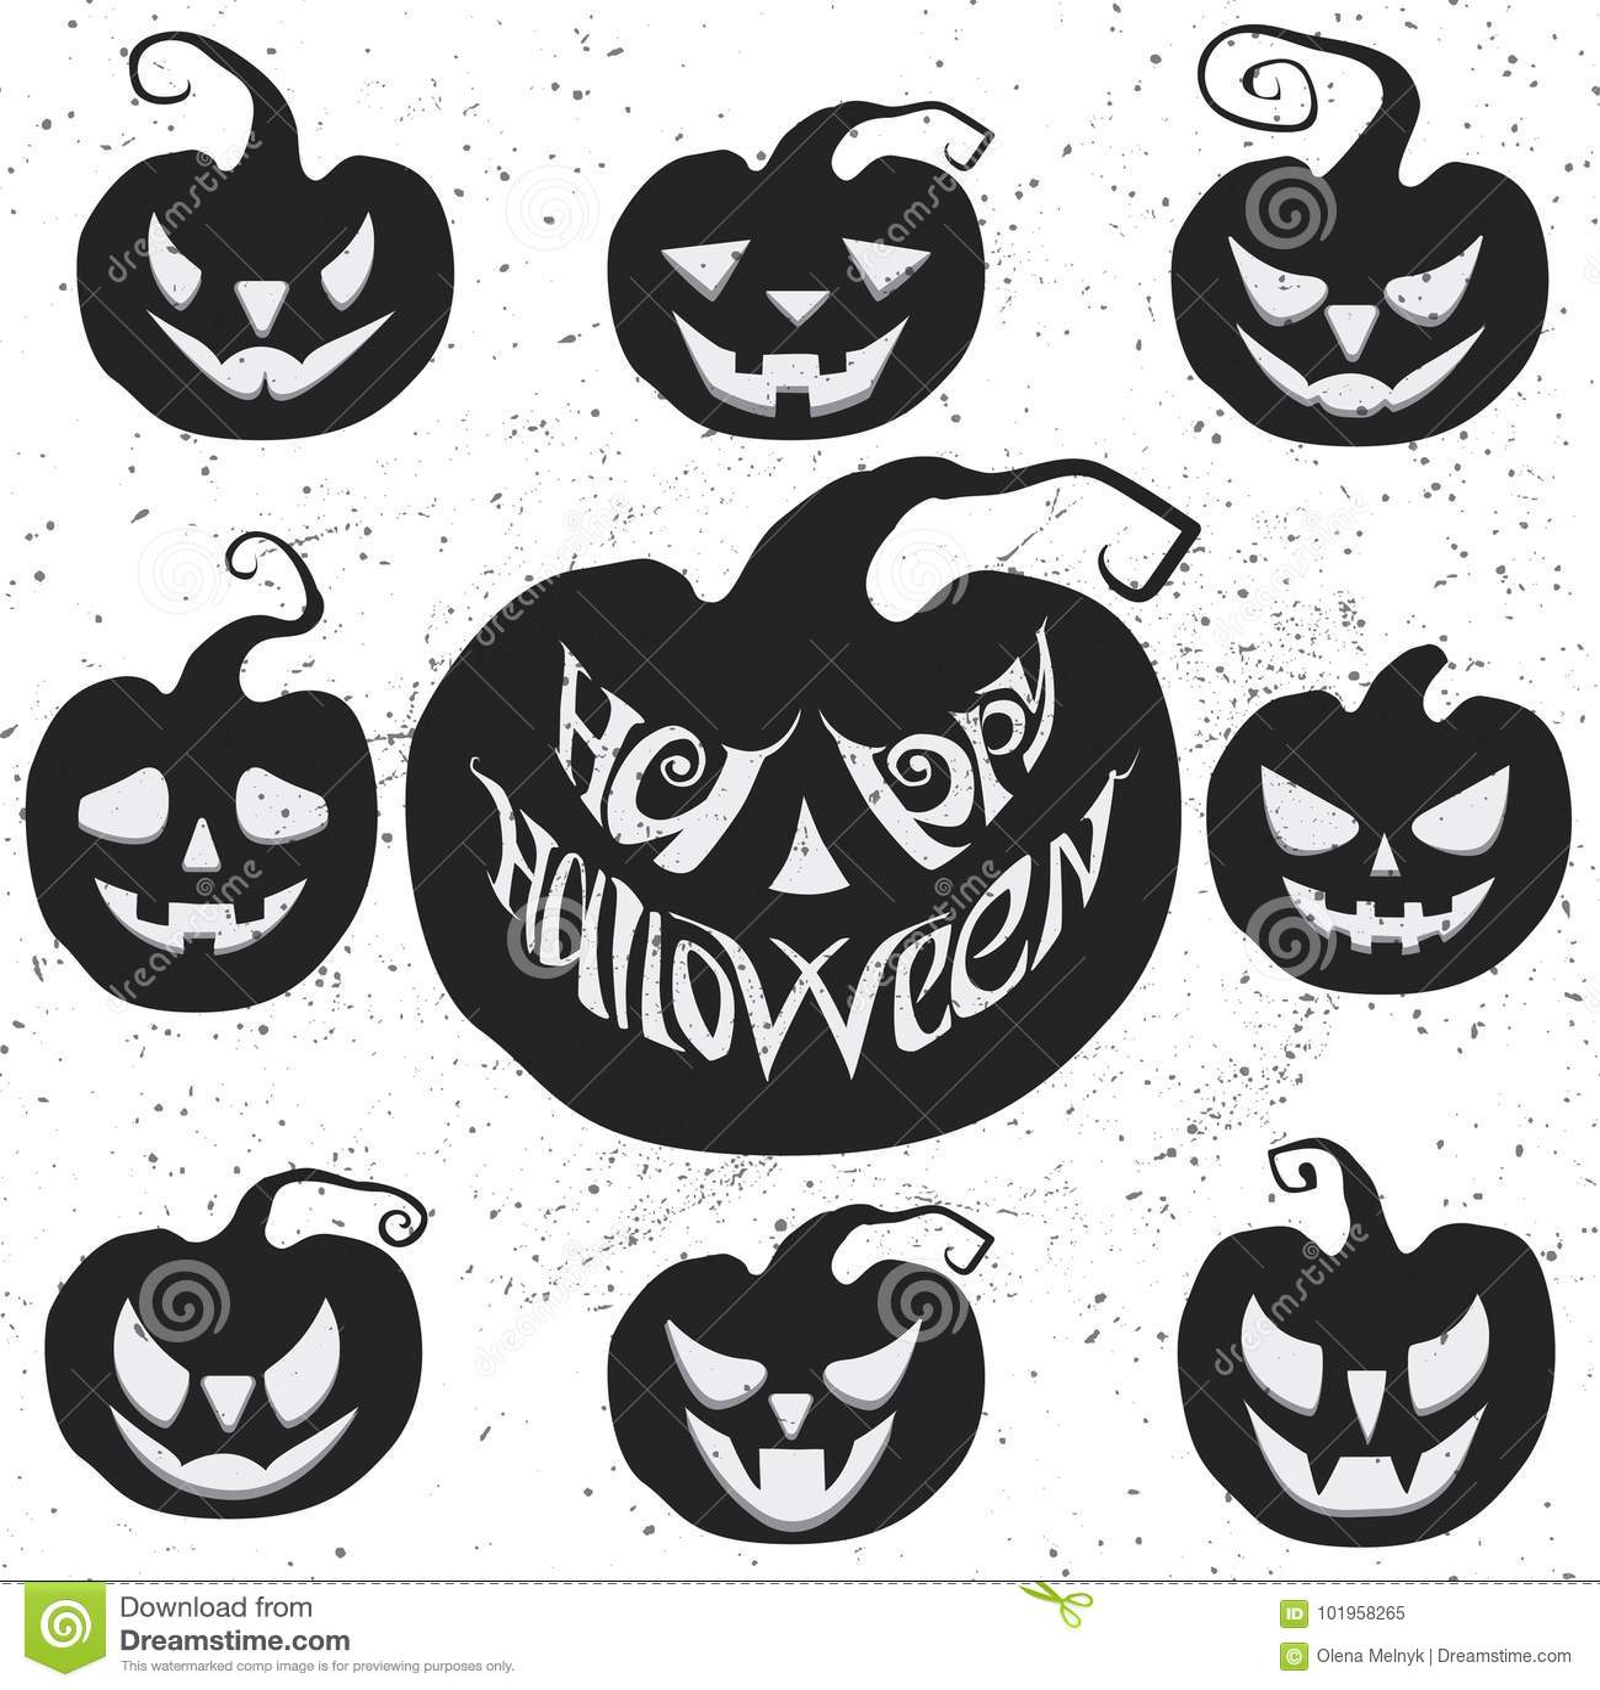 download set for halloween with pumpkin carving happy halloween vector lettering stock vector